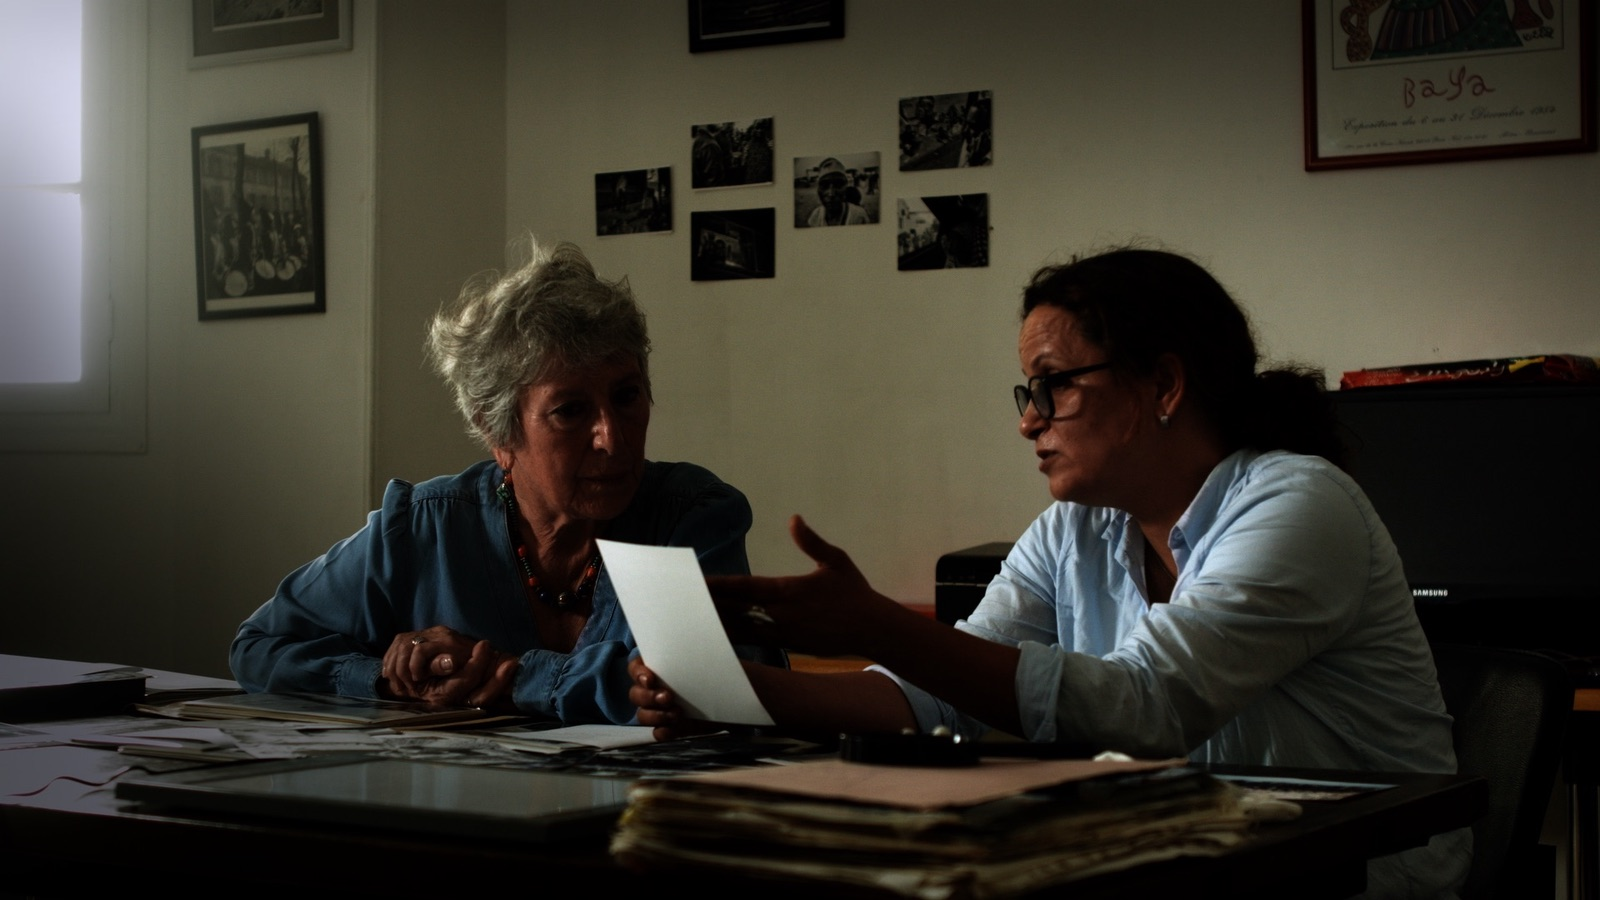 Katia Kameli, Le Roman Algérien (Chapitre 3), 2019 HD Video, 46' 59'' Courtesy the artist